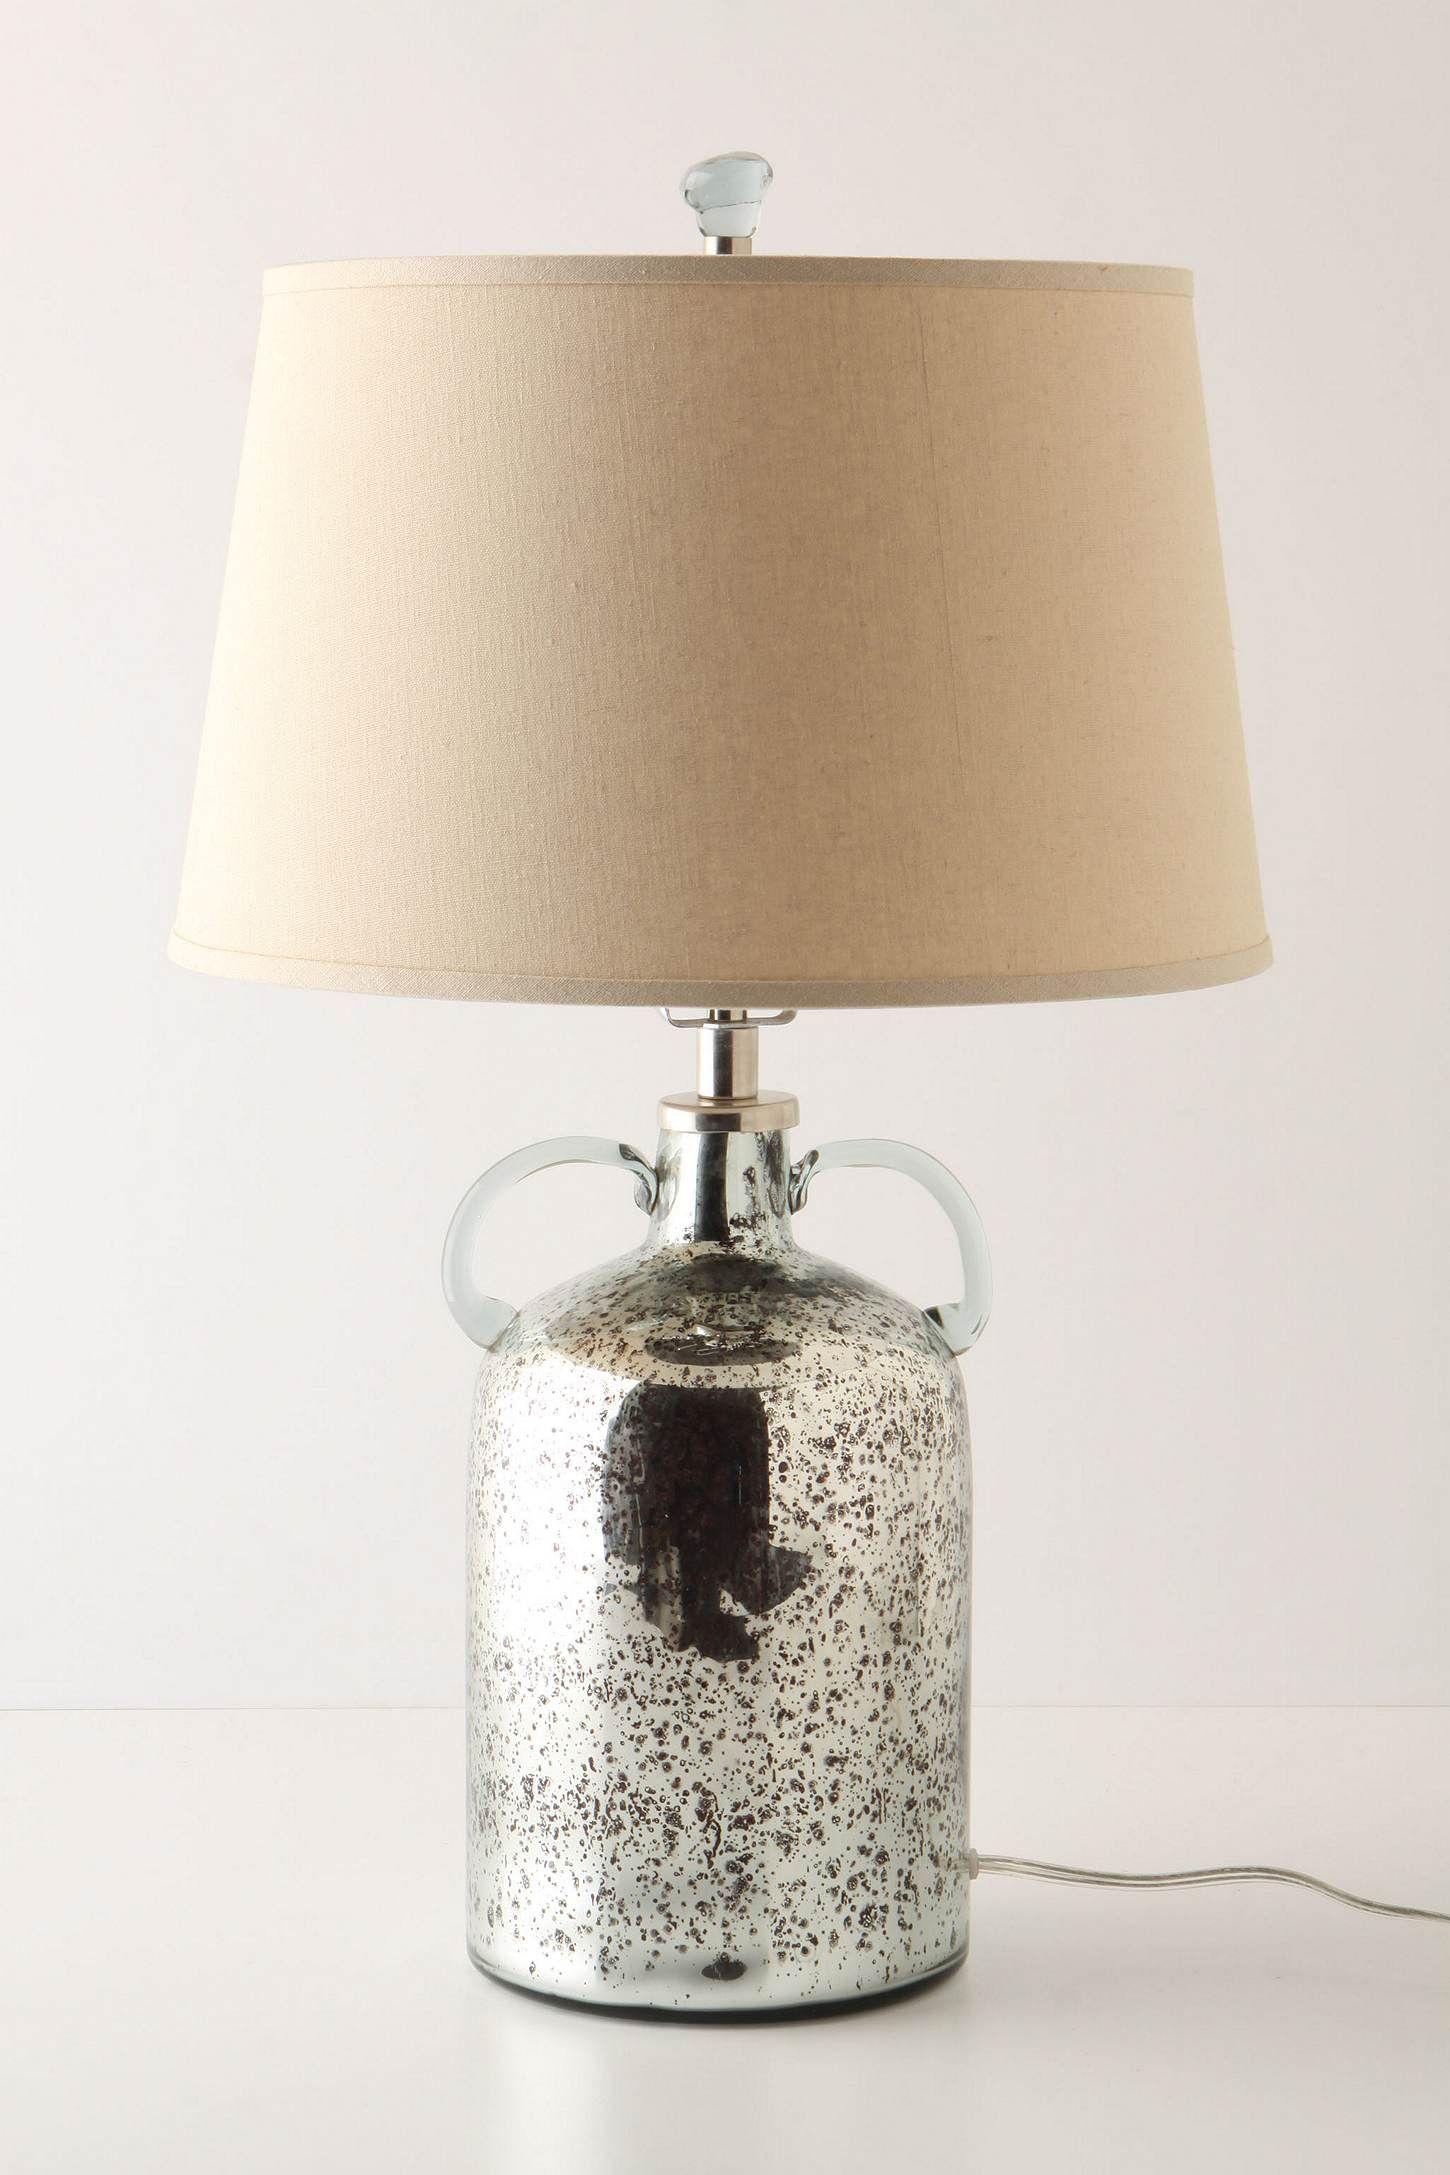 Mirror Jar Lamp Base, Small   Global Goods   Pinterest ...